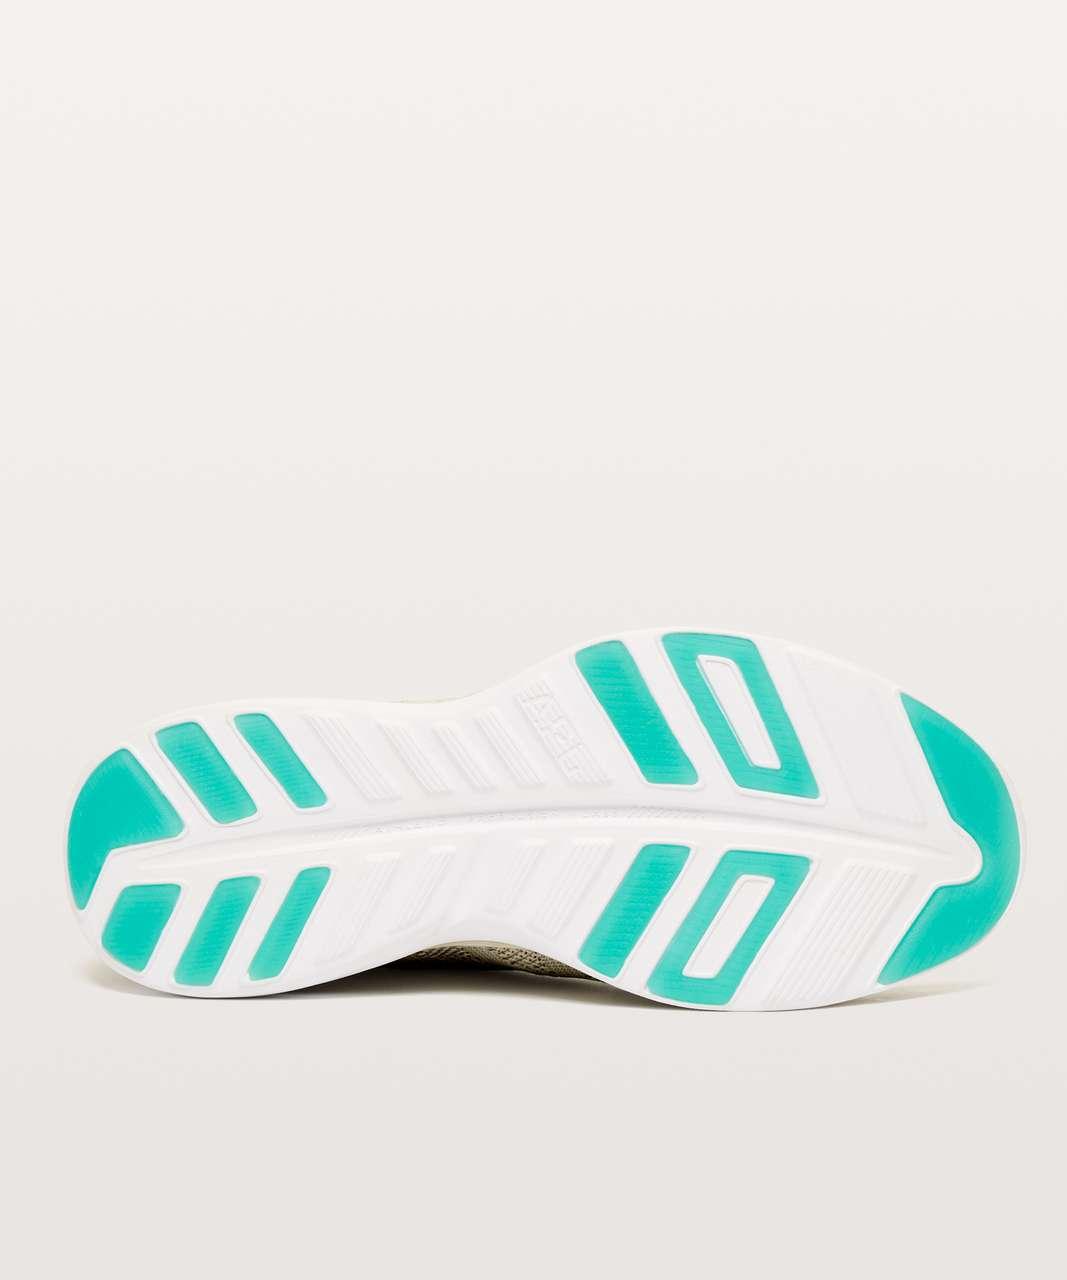 Lululemon Womens TechLoom Pro Shoe - Birch / Taupe